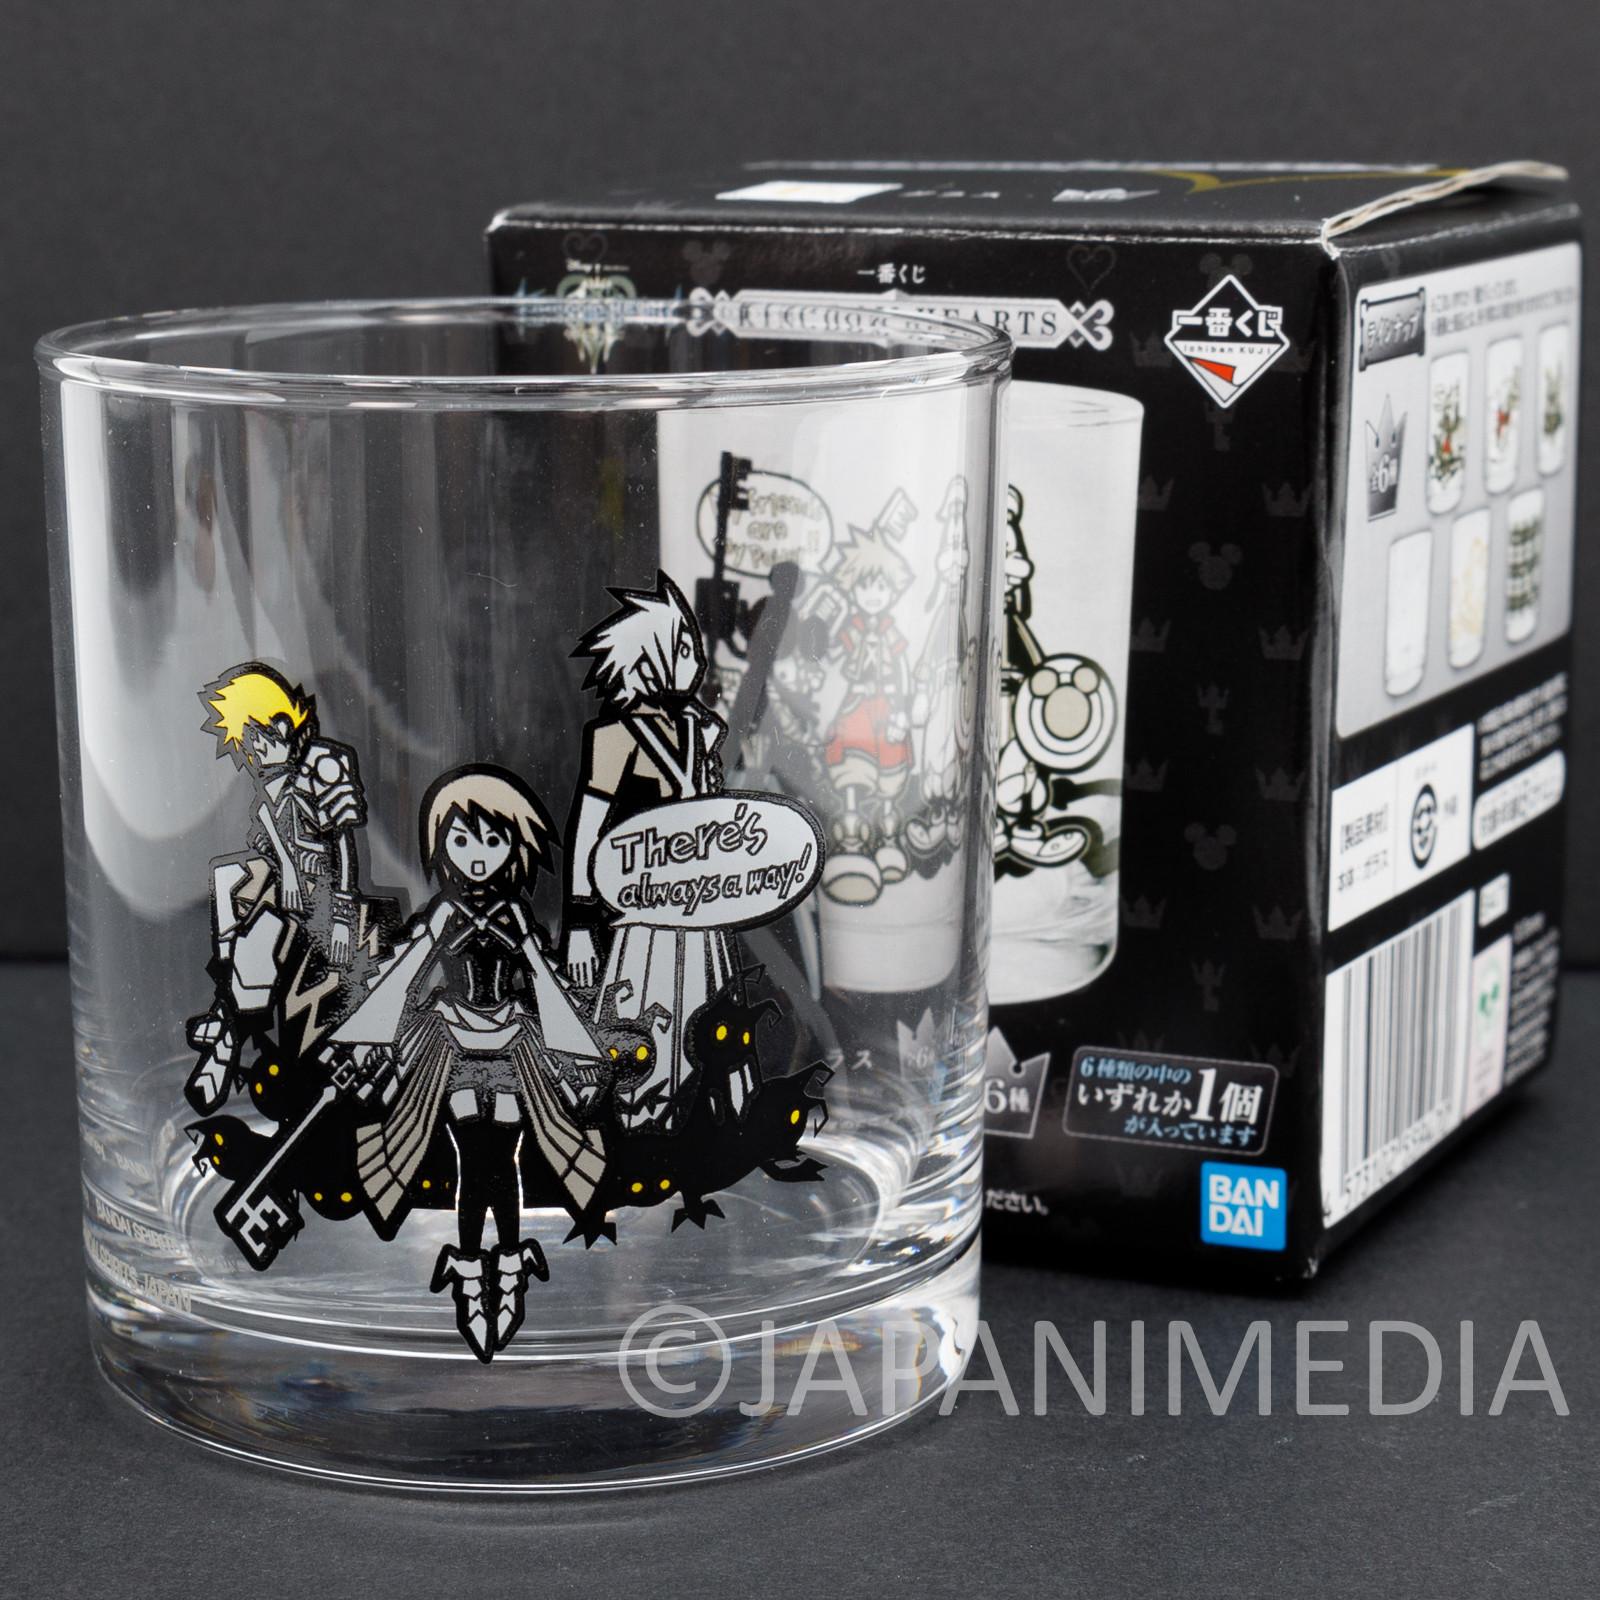 Kingdom Hearts Glass #3 BANDAI JAPAN GAME SQUARE ENIX